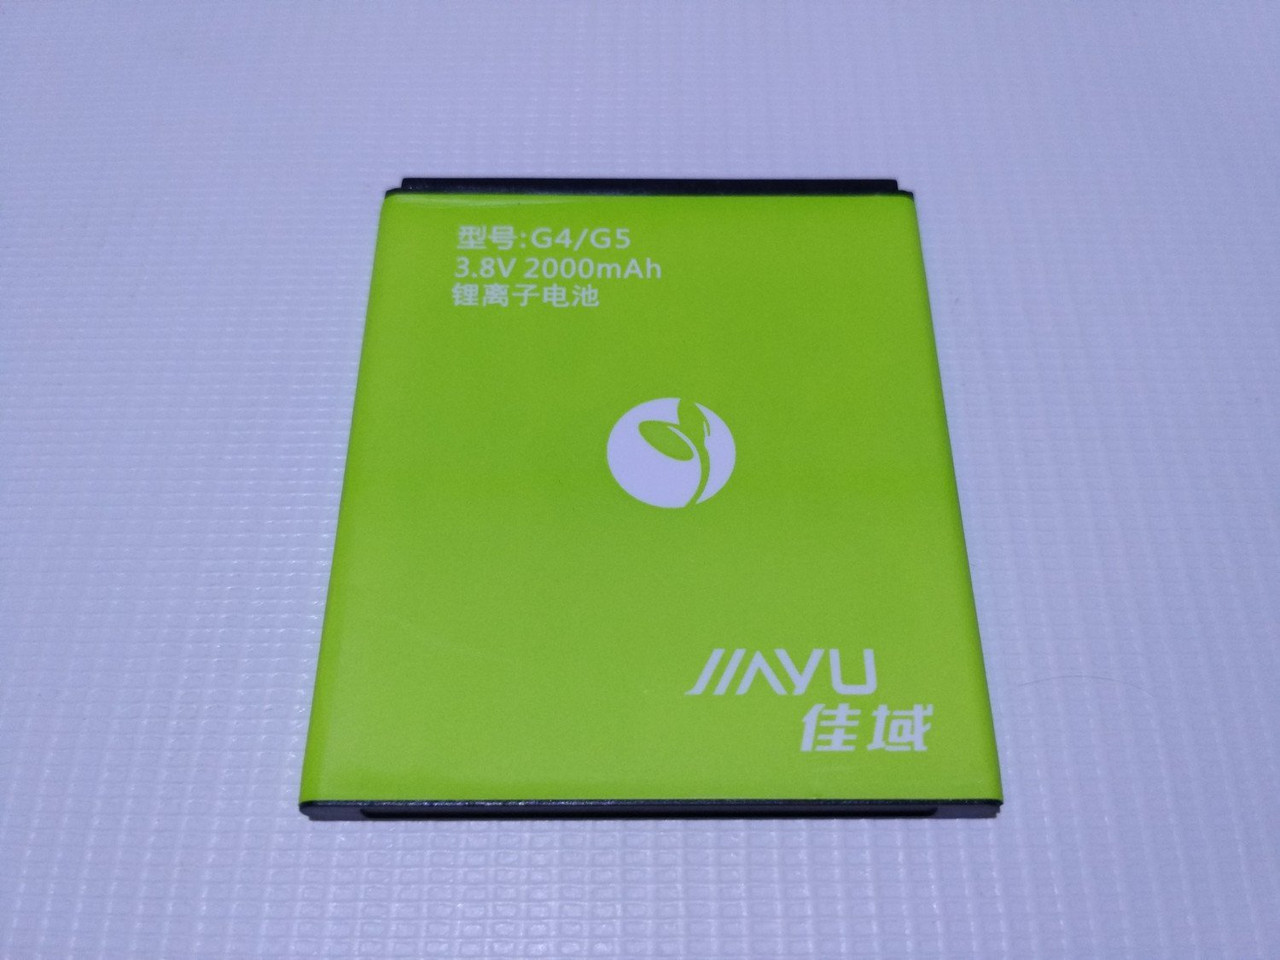 Оригинальная батарея аккумулятор для Jiayu G4 G4S G5 G5S 2000 mAh